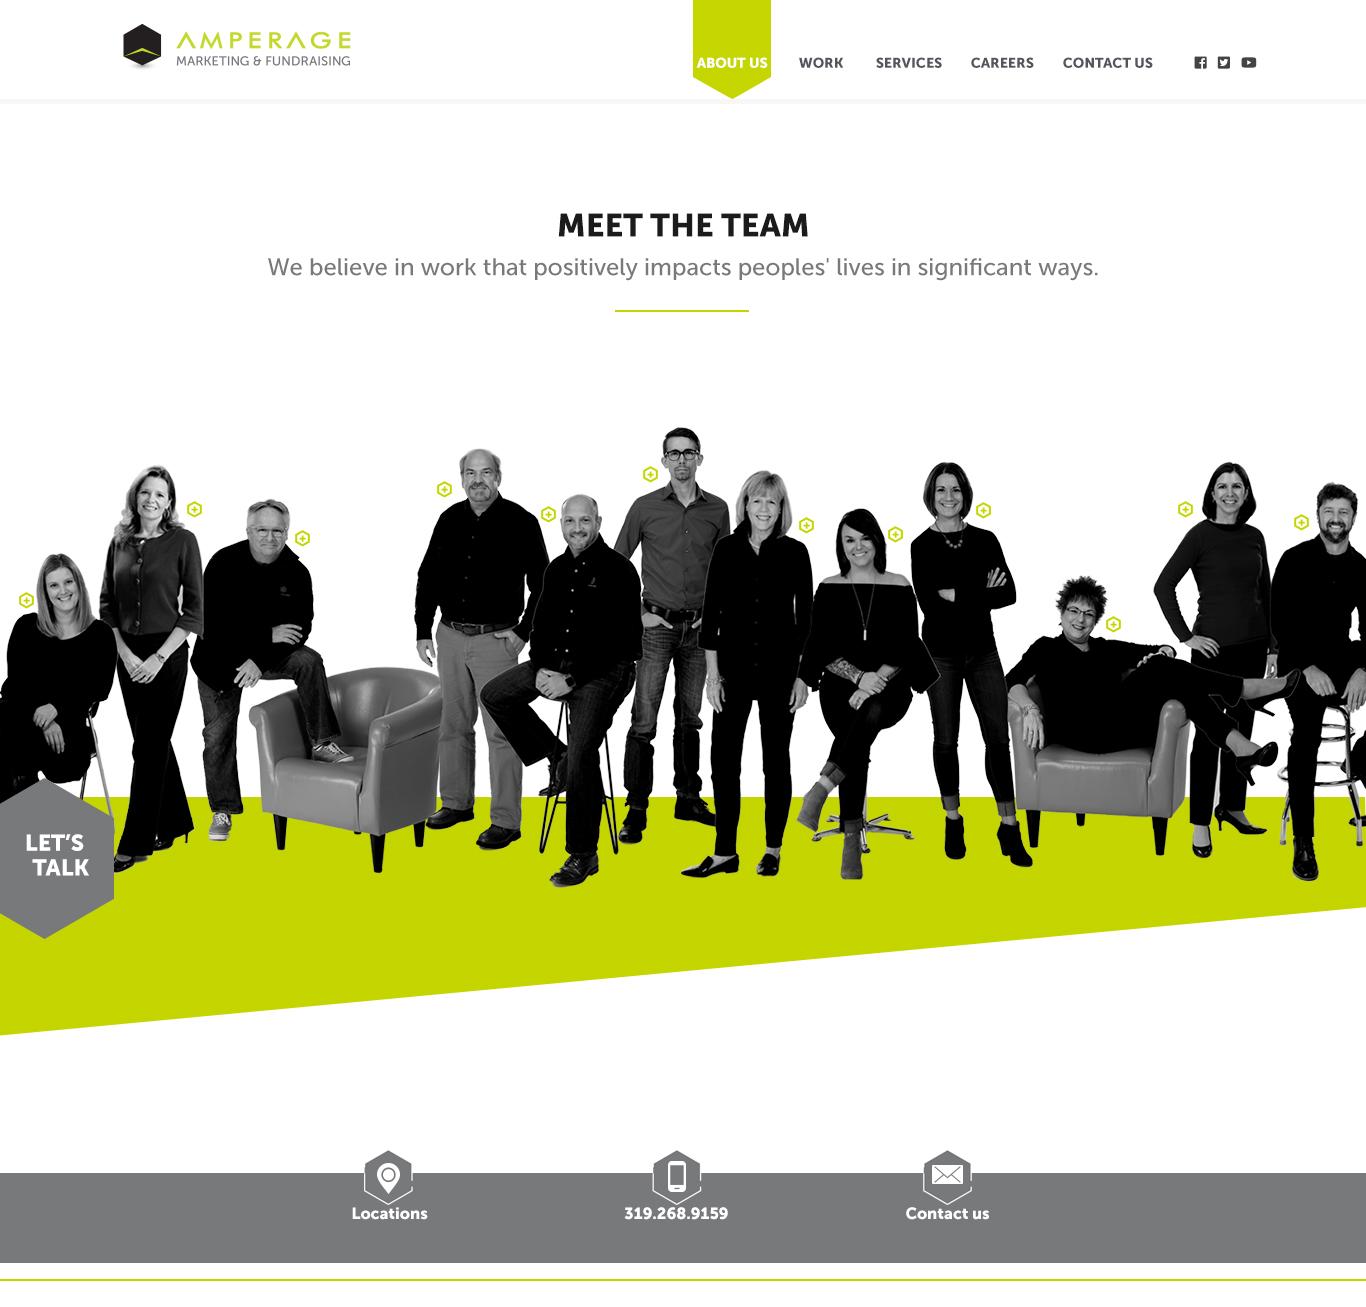 AMPERAGE Meet The Team Design